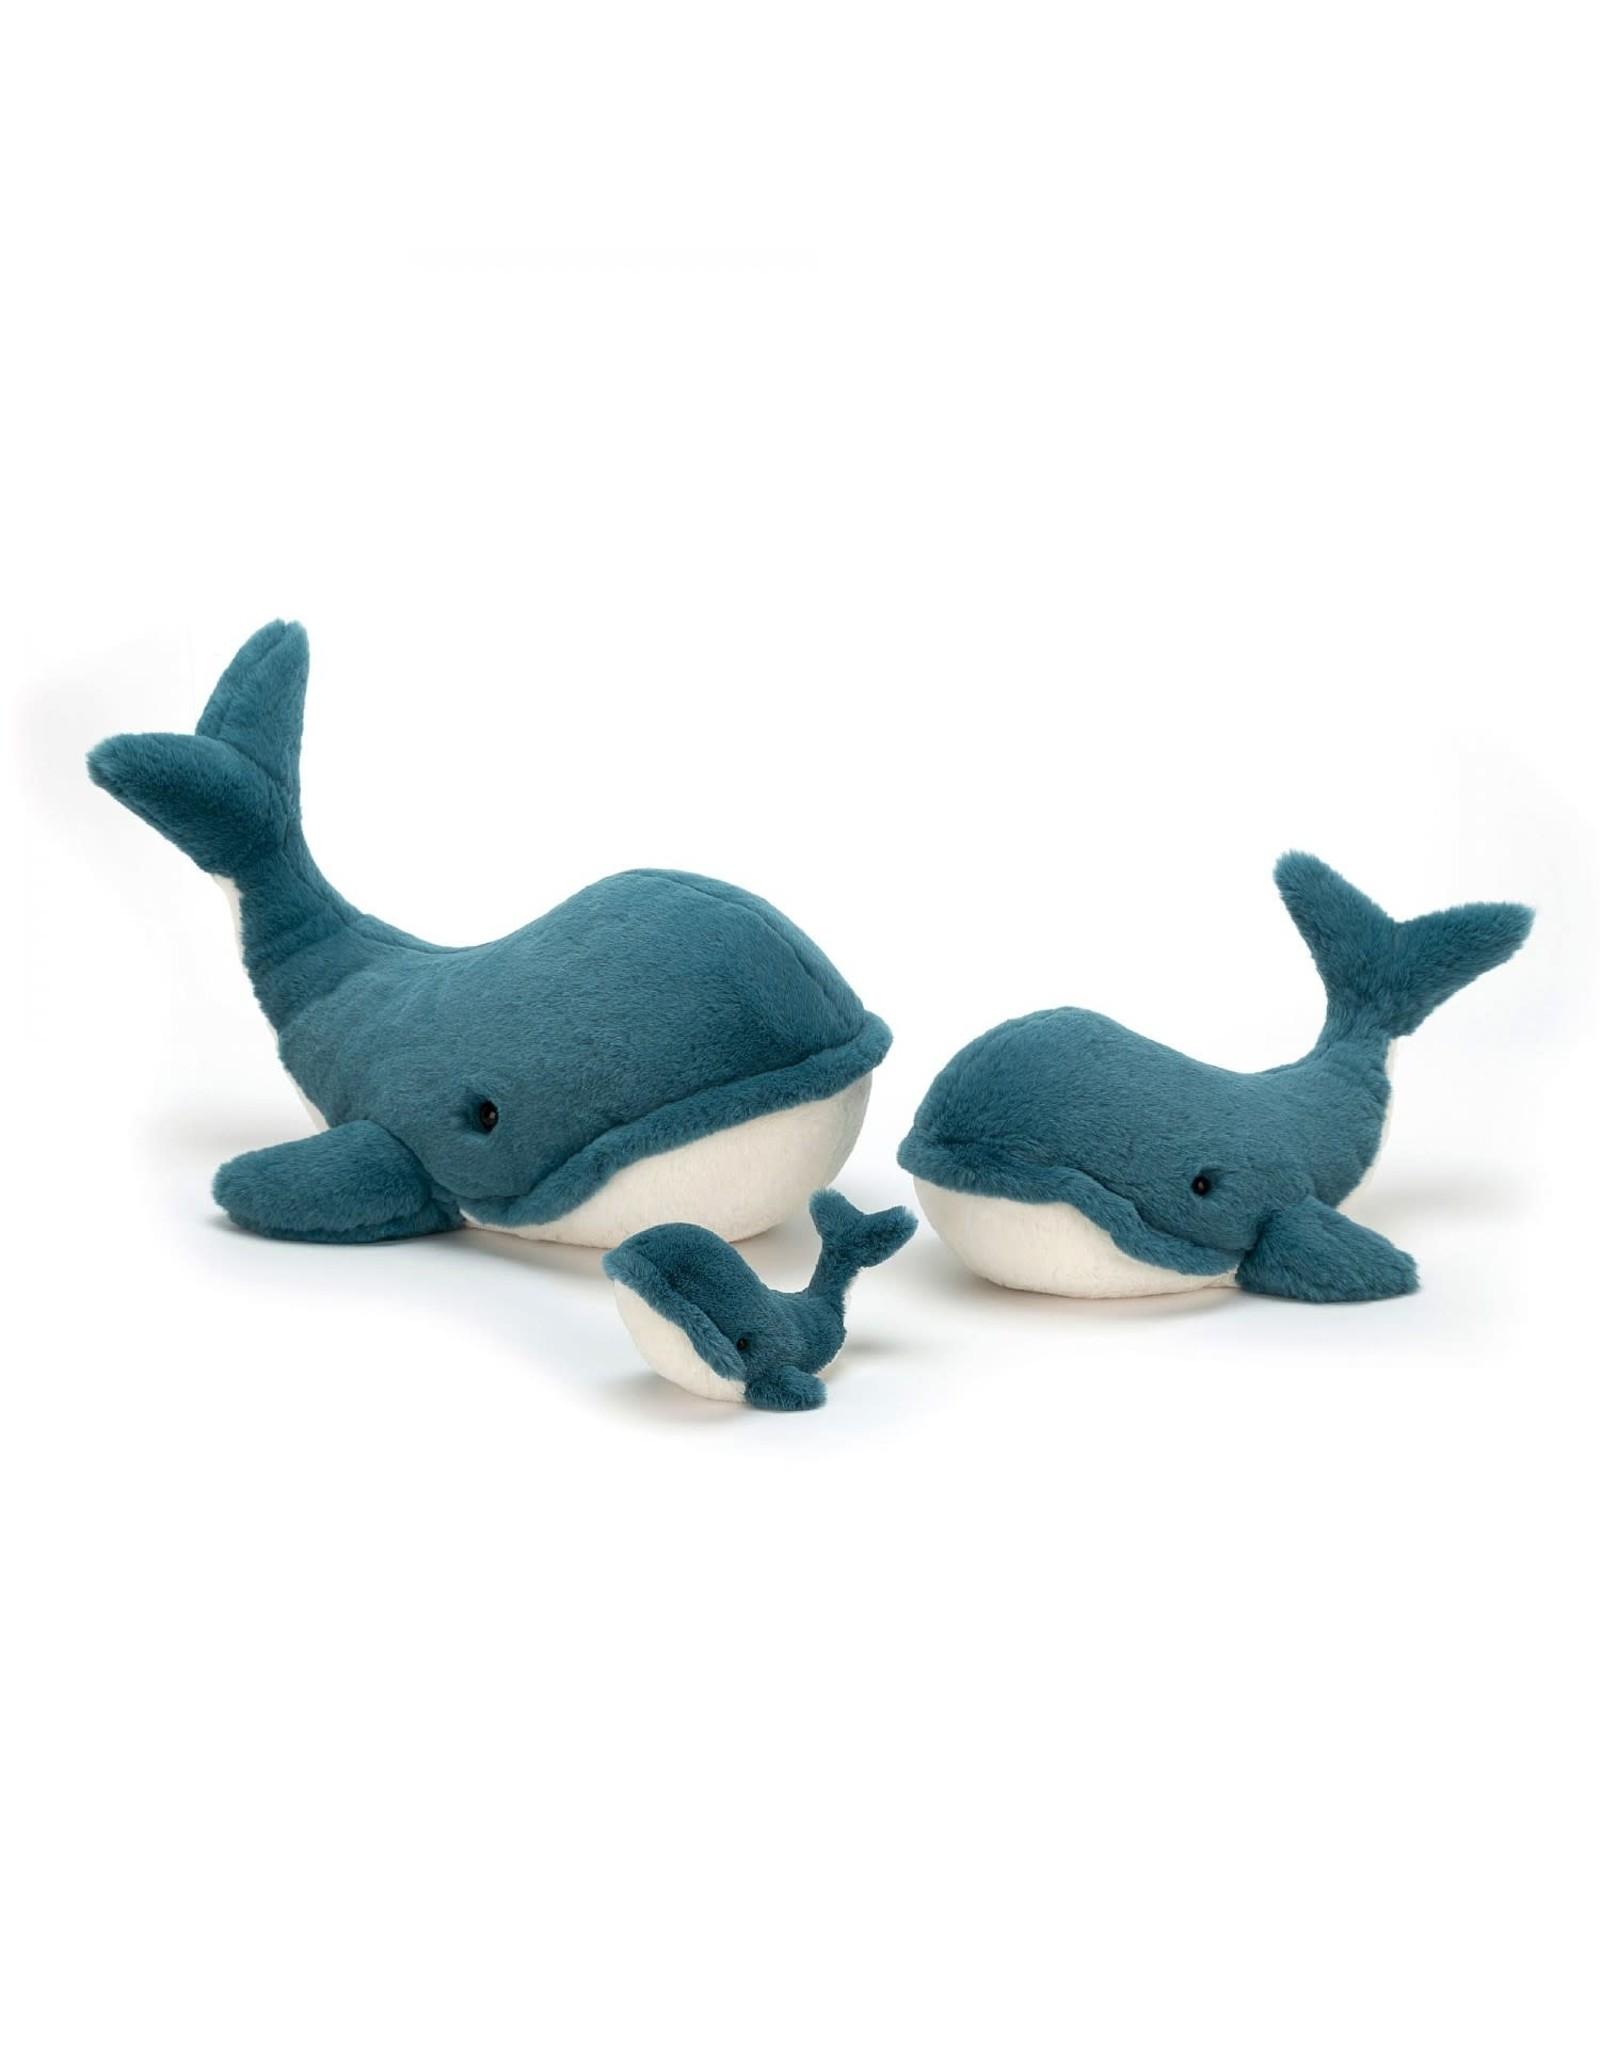 Jellycat Wally - Whale